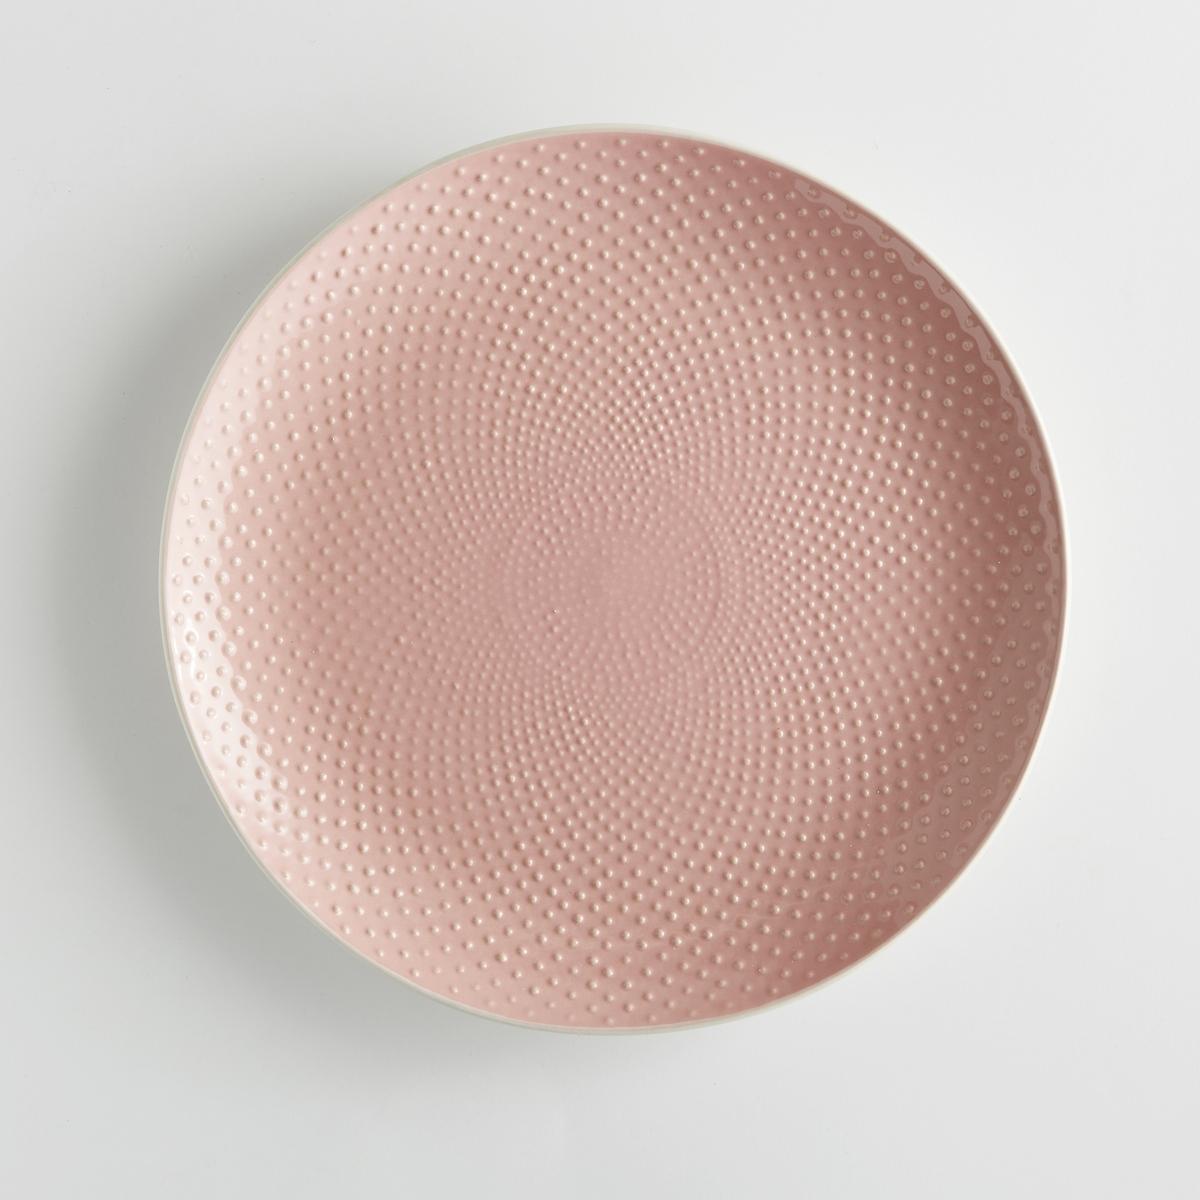 4 тарелки плоские с рисунком в крапинку Arsenia диляра шкурко серое прозрачное в крапинку